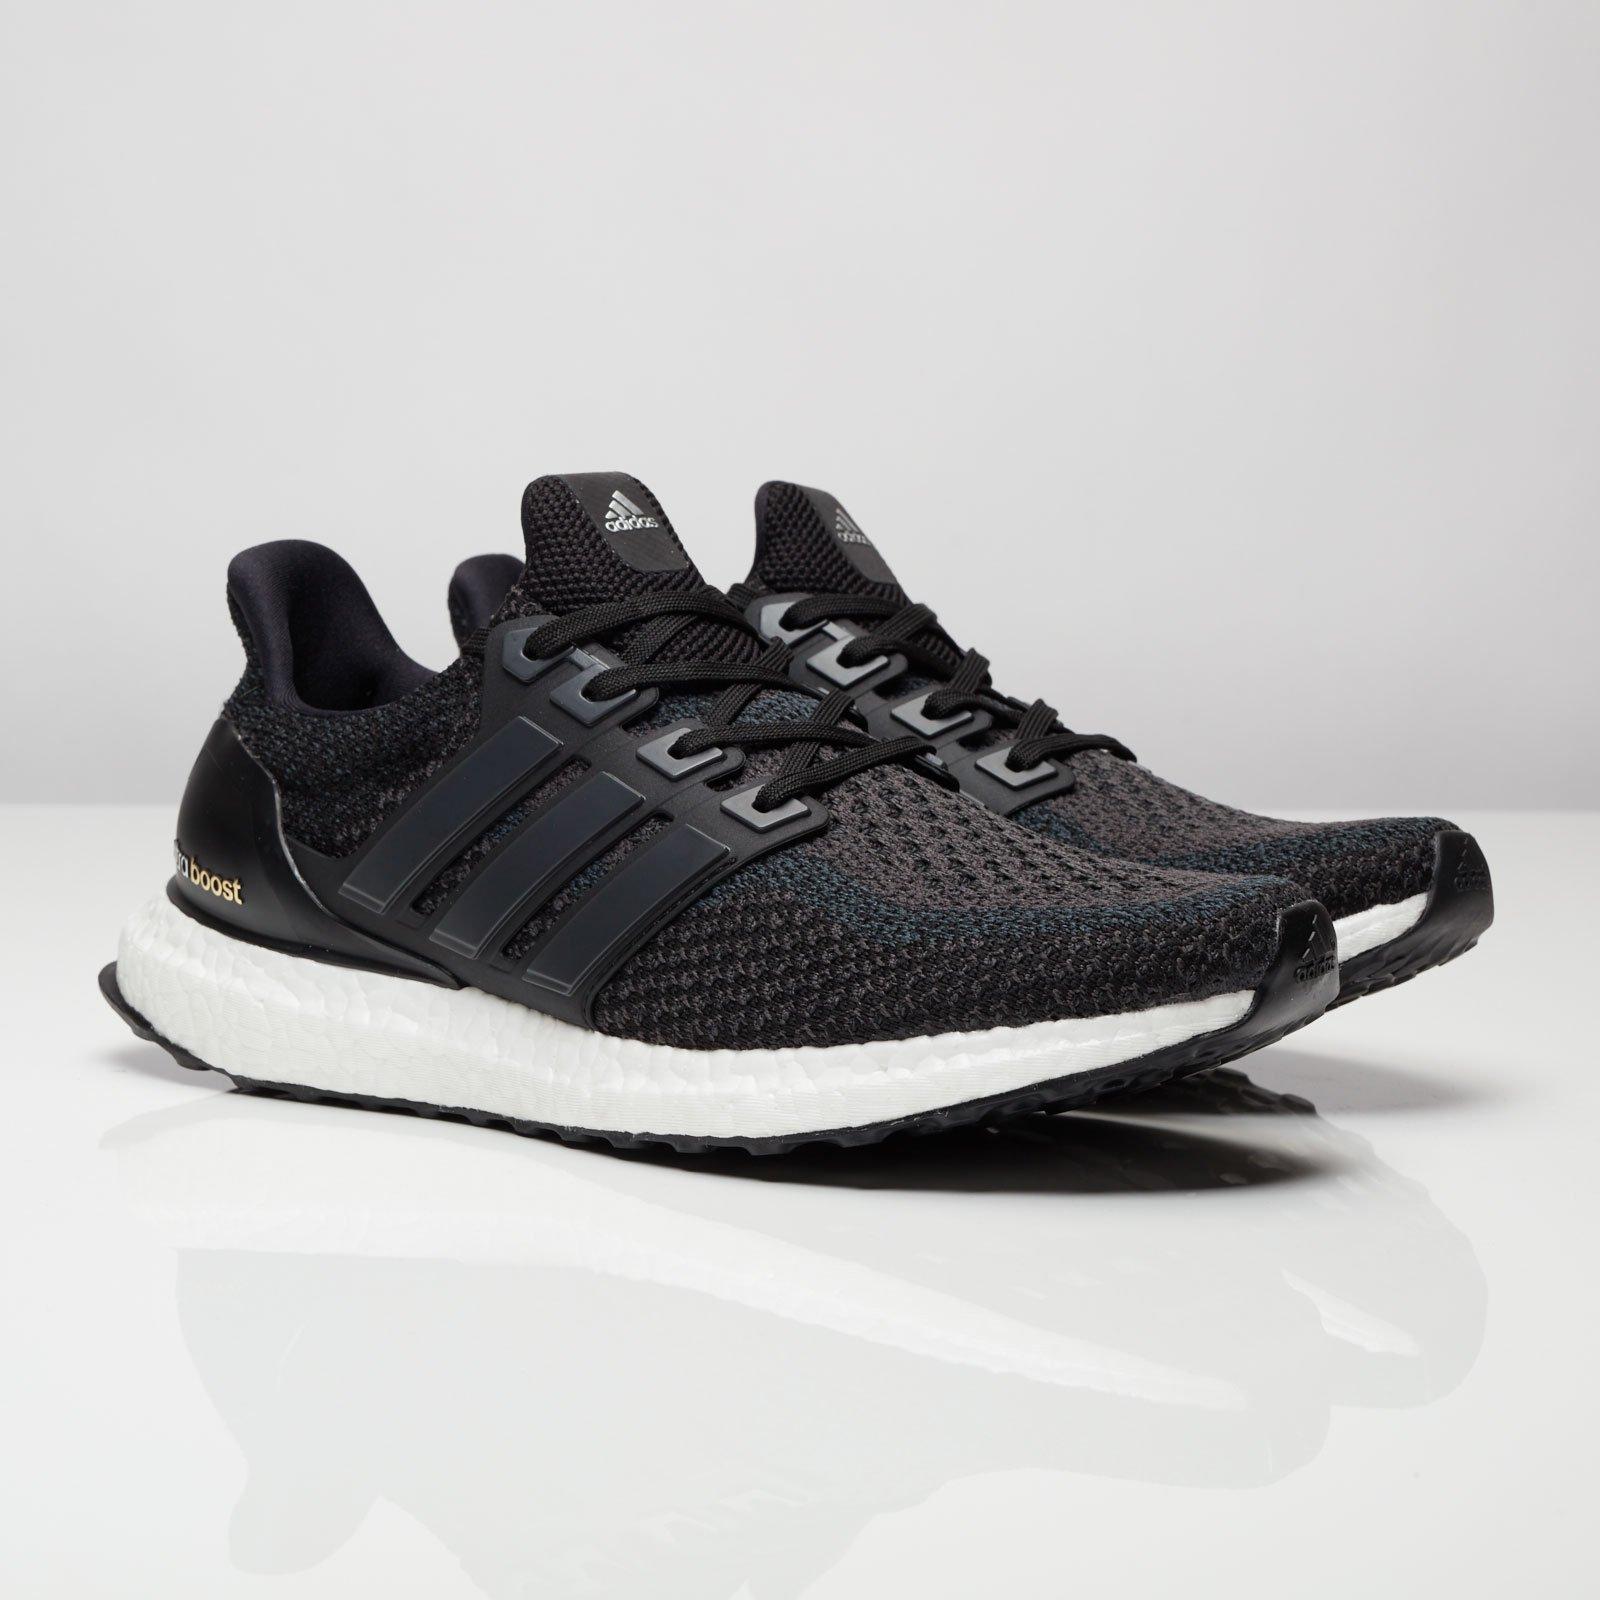 brand new 29629 05596 adidas ultra boost - Bb3909 - Sneakersnstuff | sneakers ...